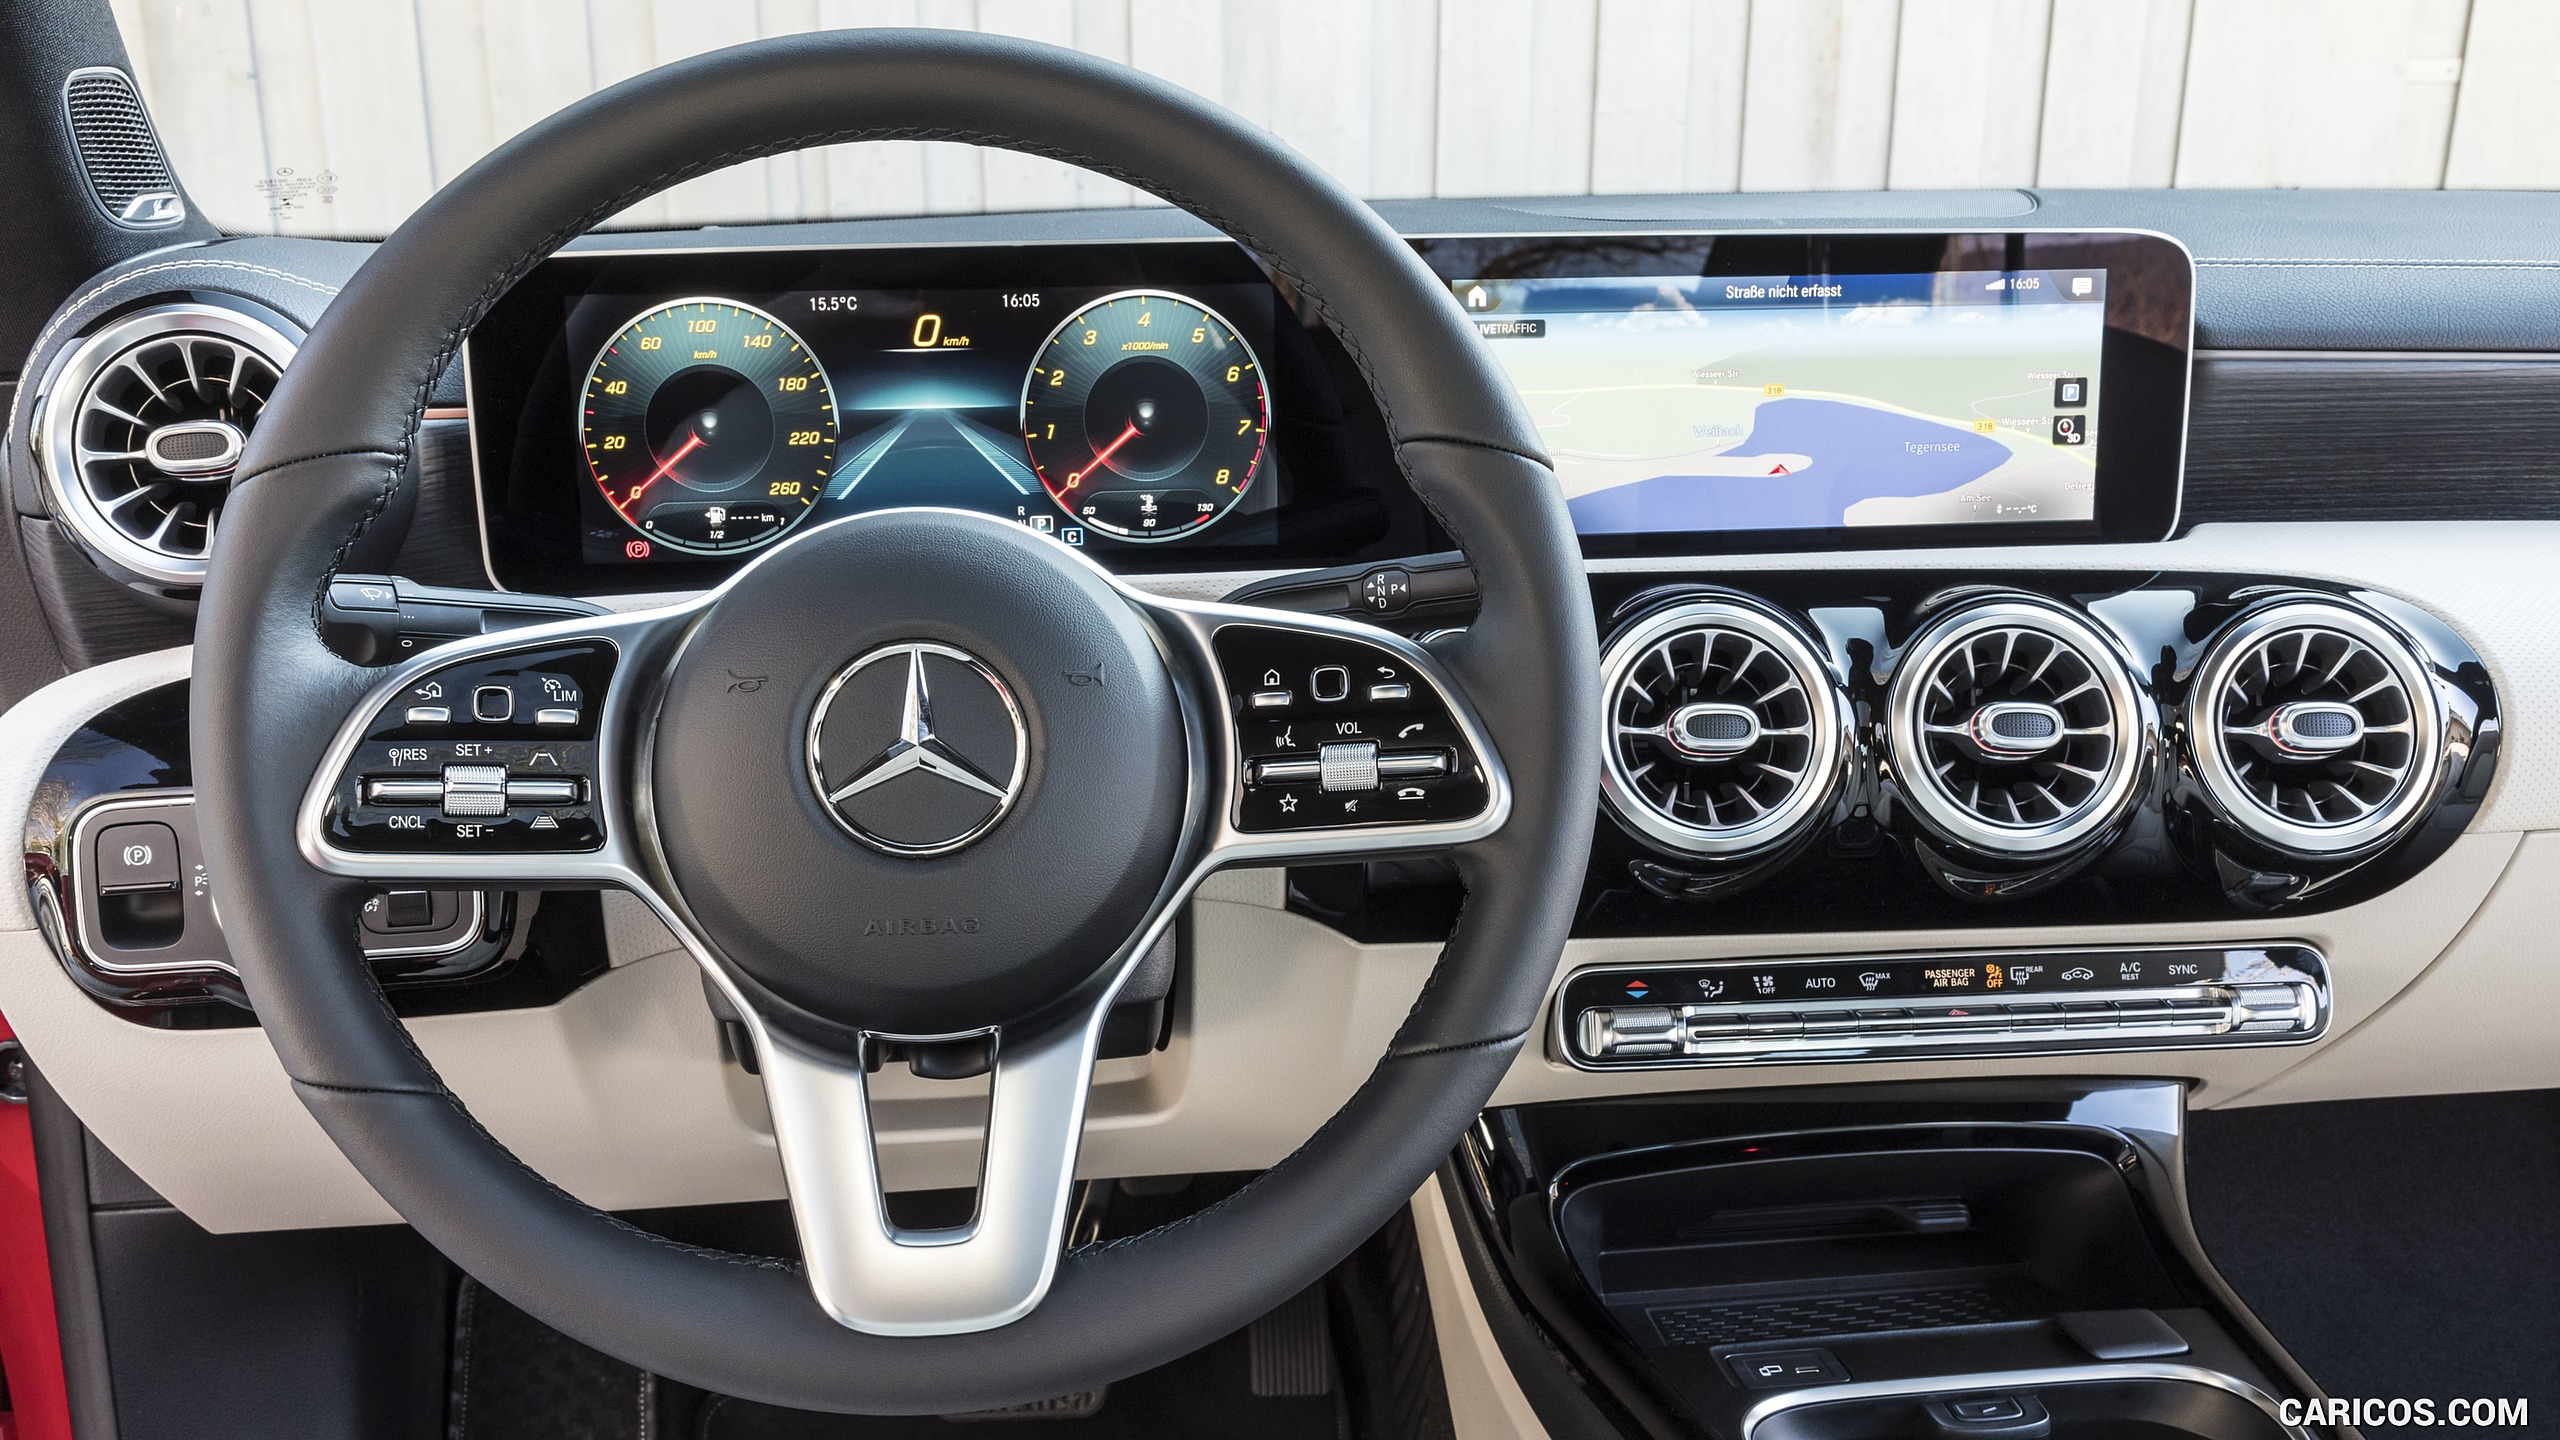 2020 Mercedes Benz CLA 200 Coupe   Interior HD Wallpaper 109 2560x1440